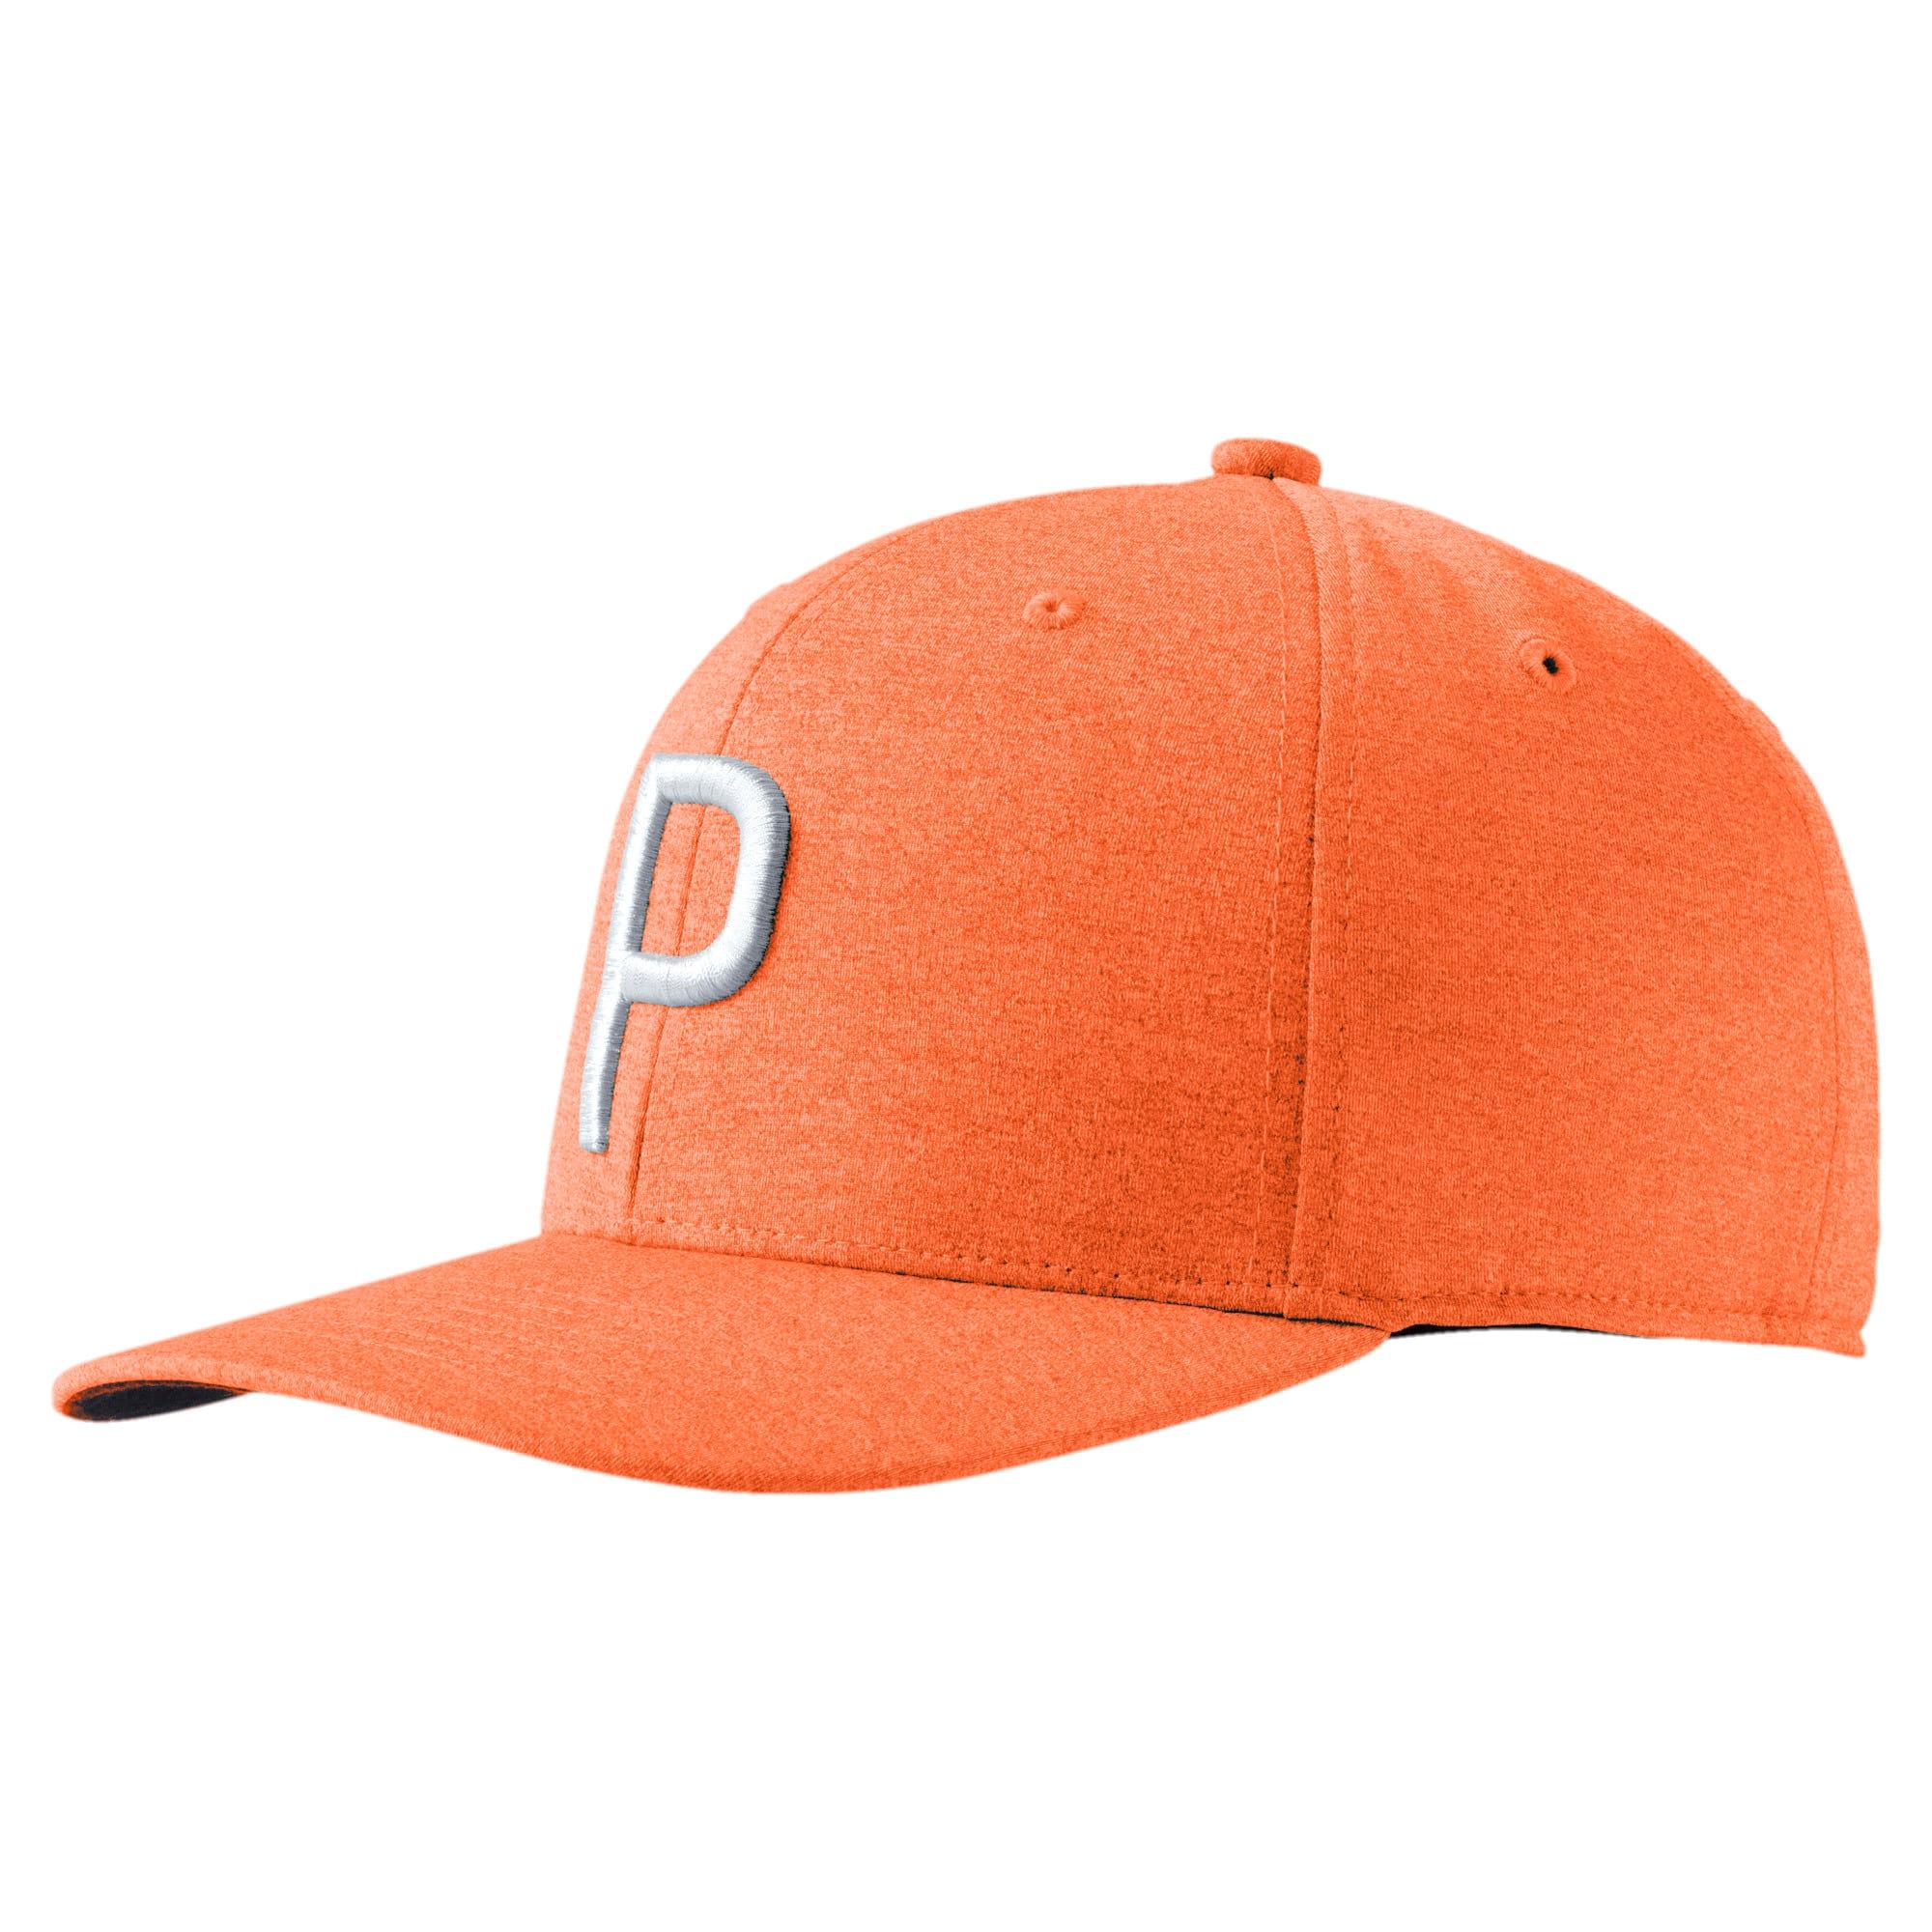 Thumbnail 1 of P Snapback Hat, Vibrant Orange, medium